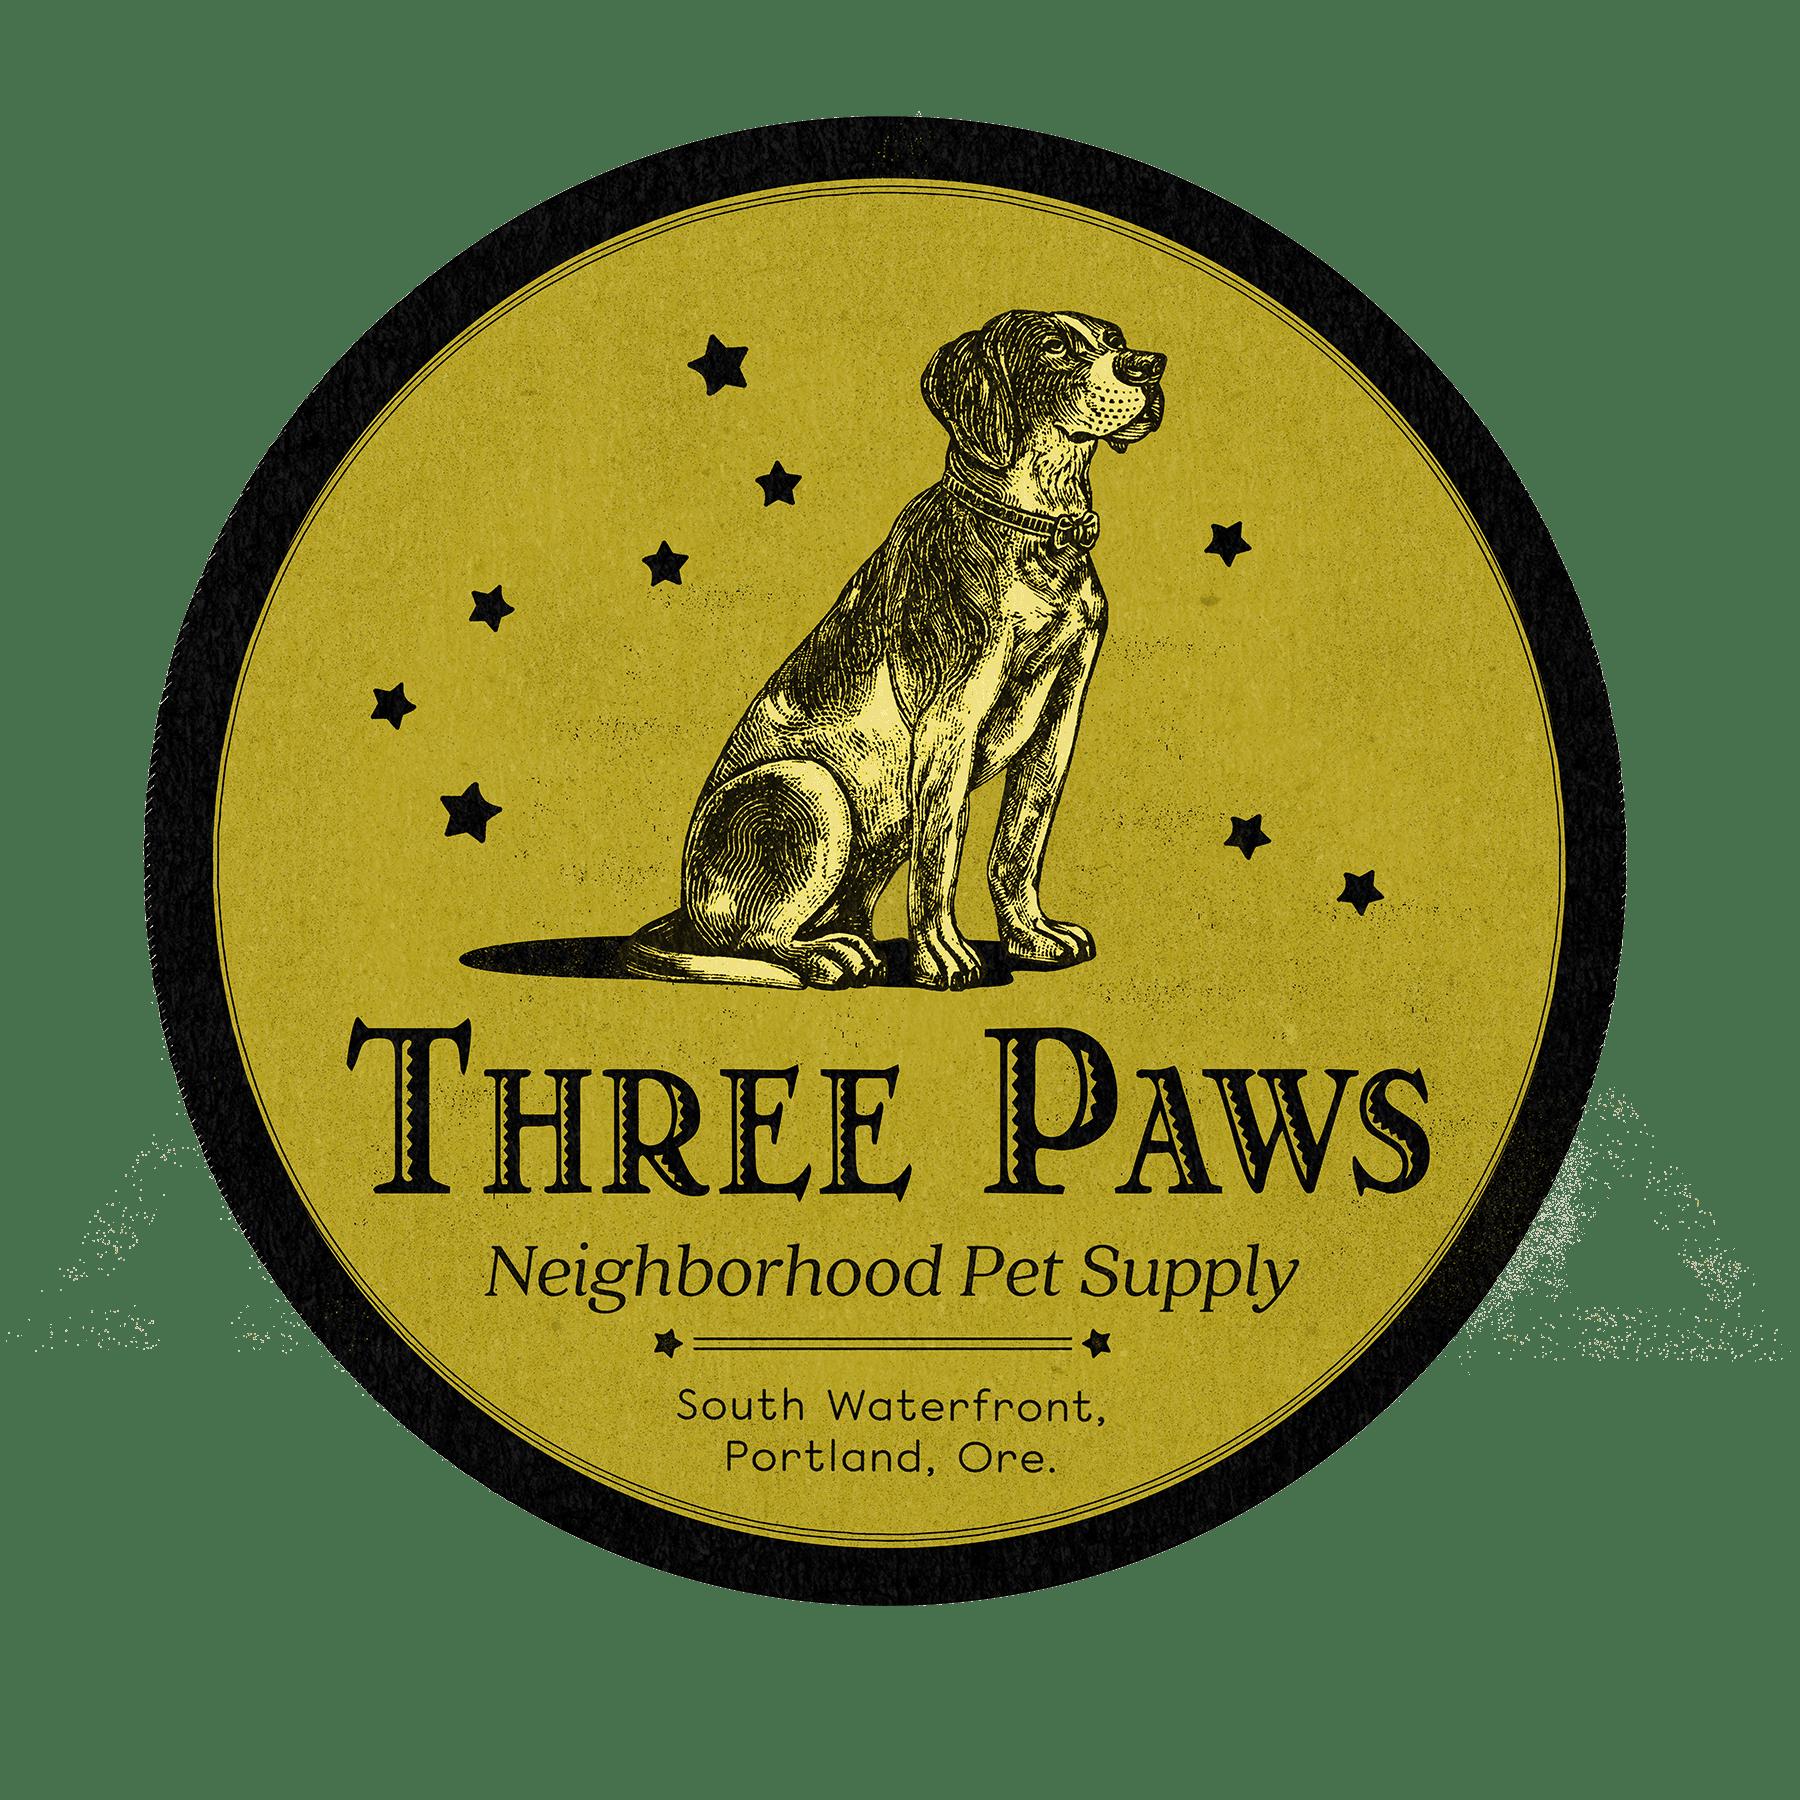 Three Paws Pet Supply